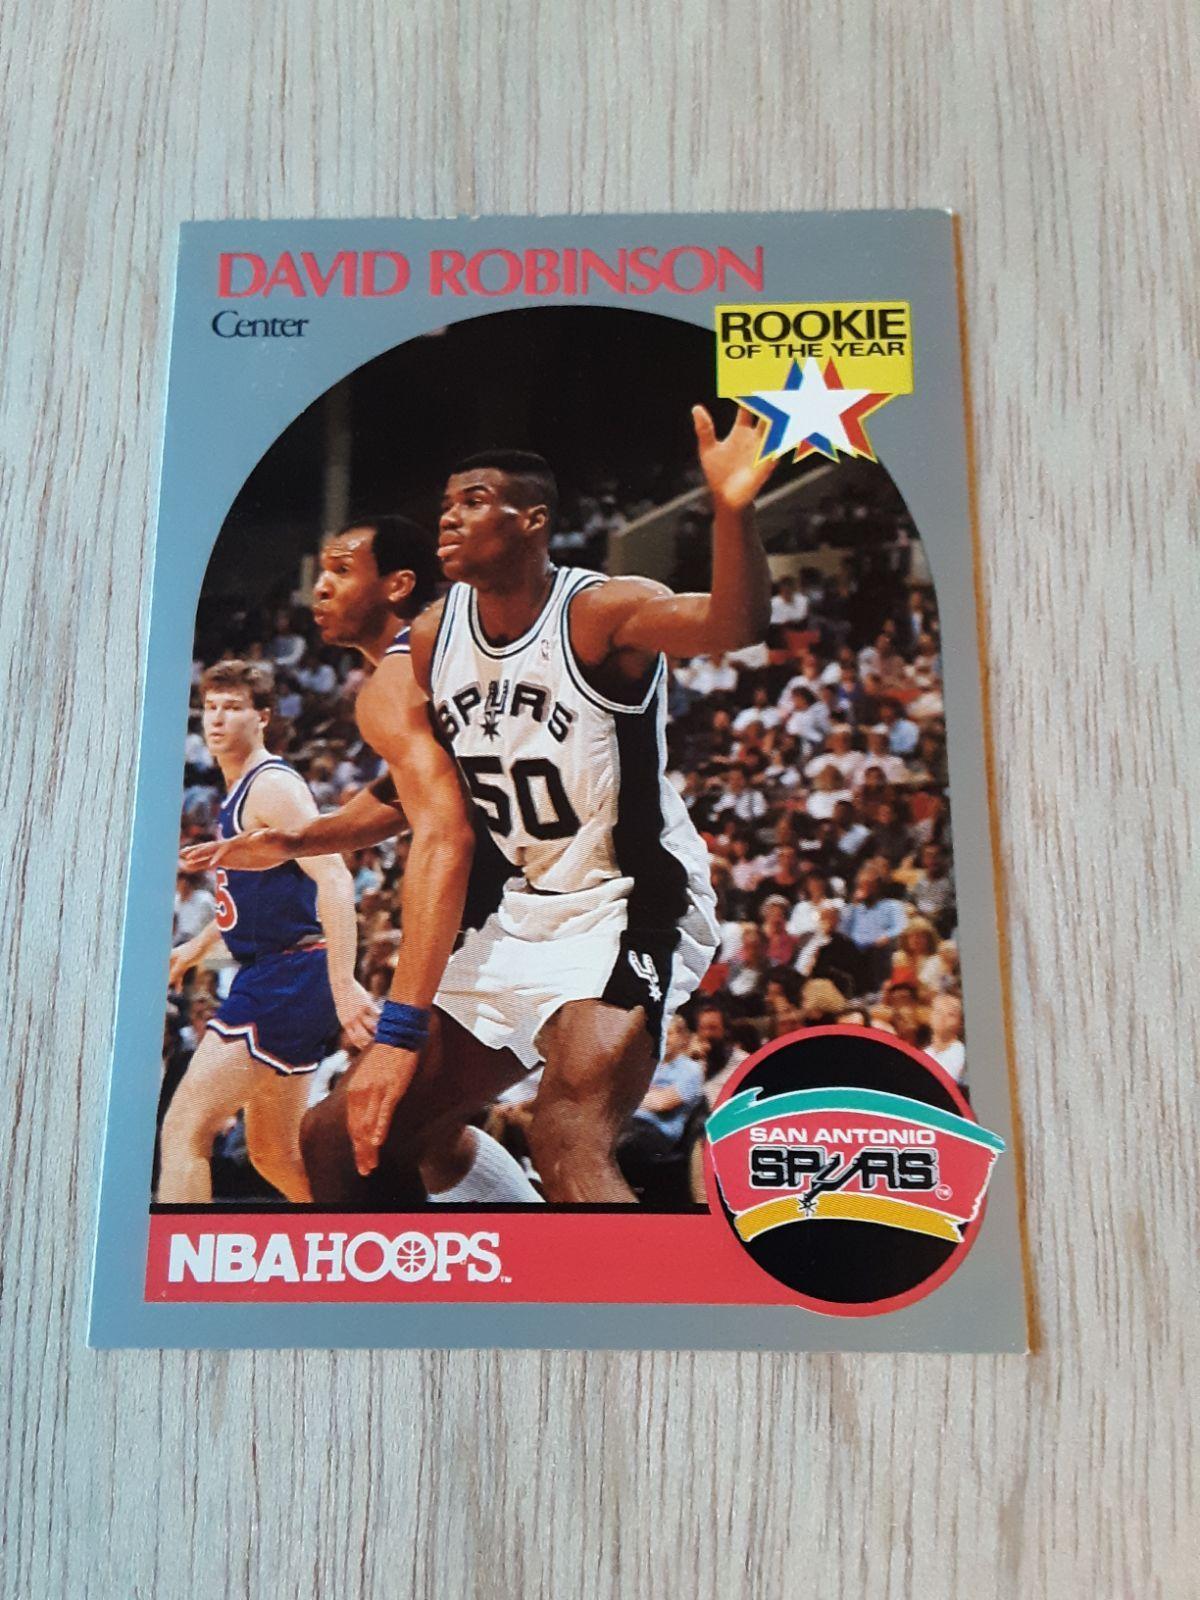 1990 nba hoops rookie of the year 1990 david